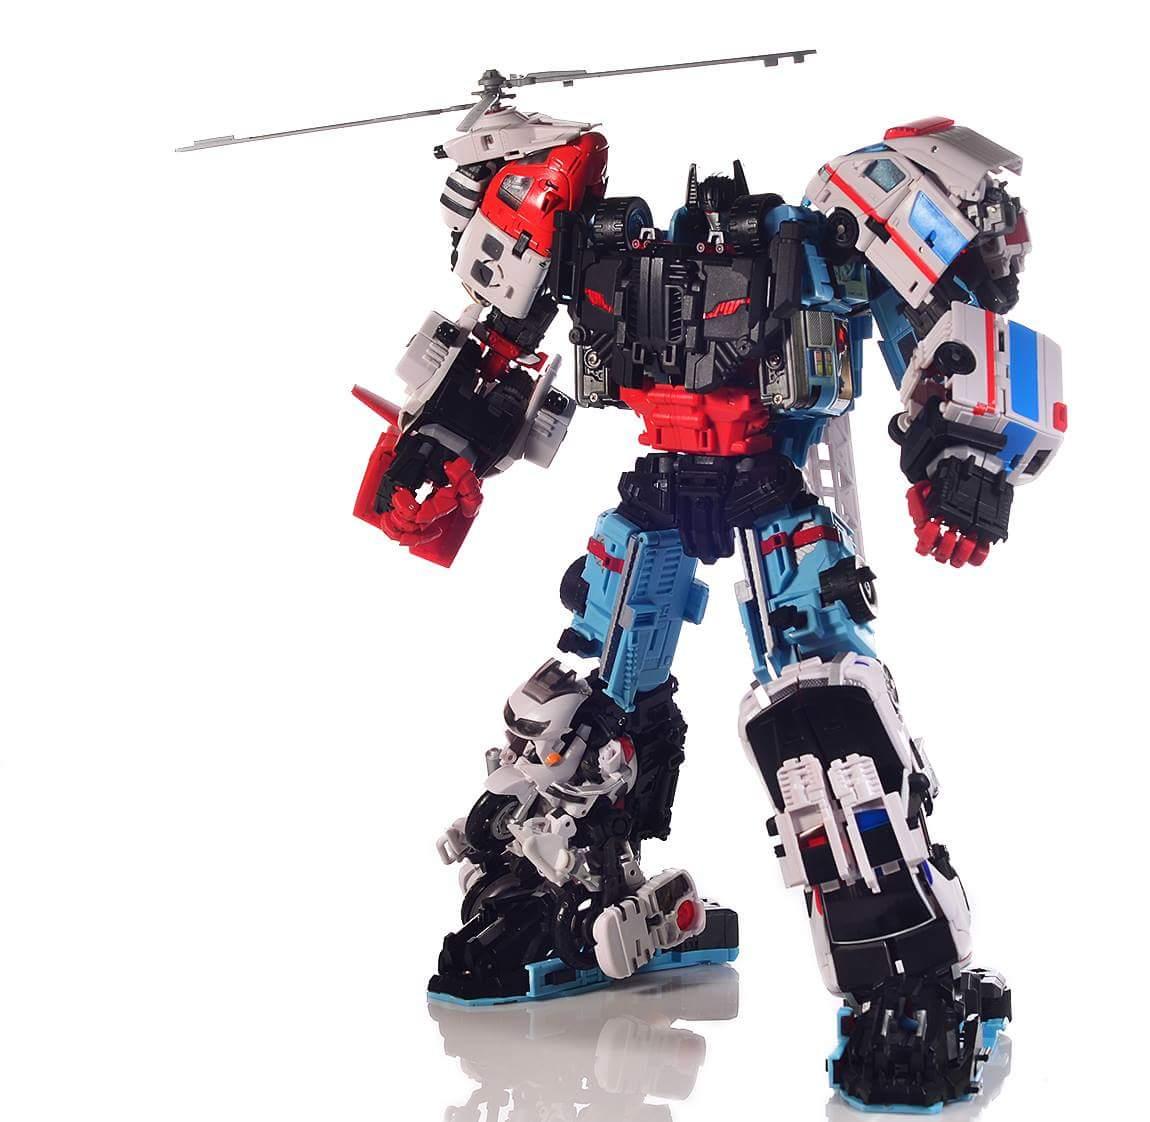 [MakeToys] Produit Tiers - Jouet MTCM-04 Guardia (aka Protectobots - Defensor/Defenso) - Page 2 H6kxNTve